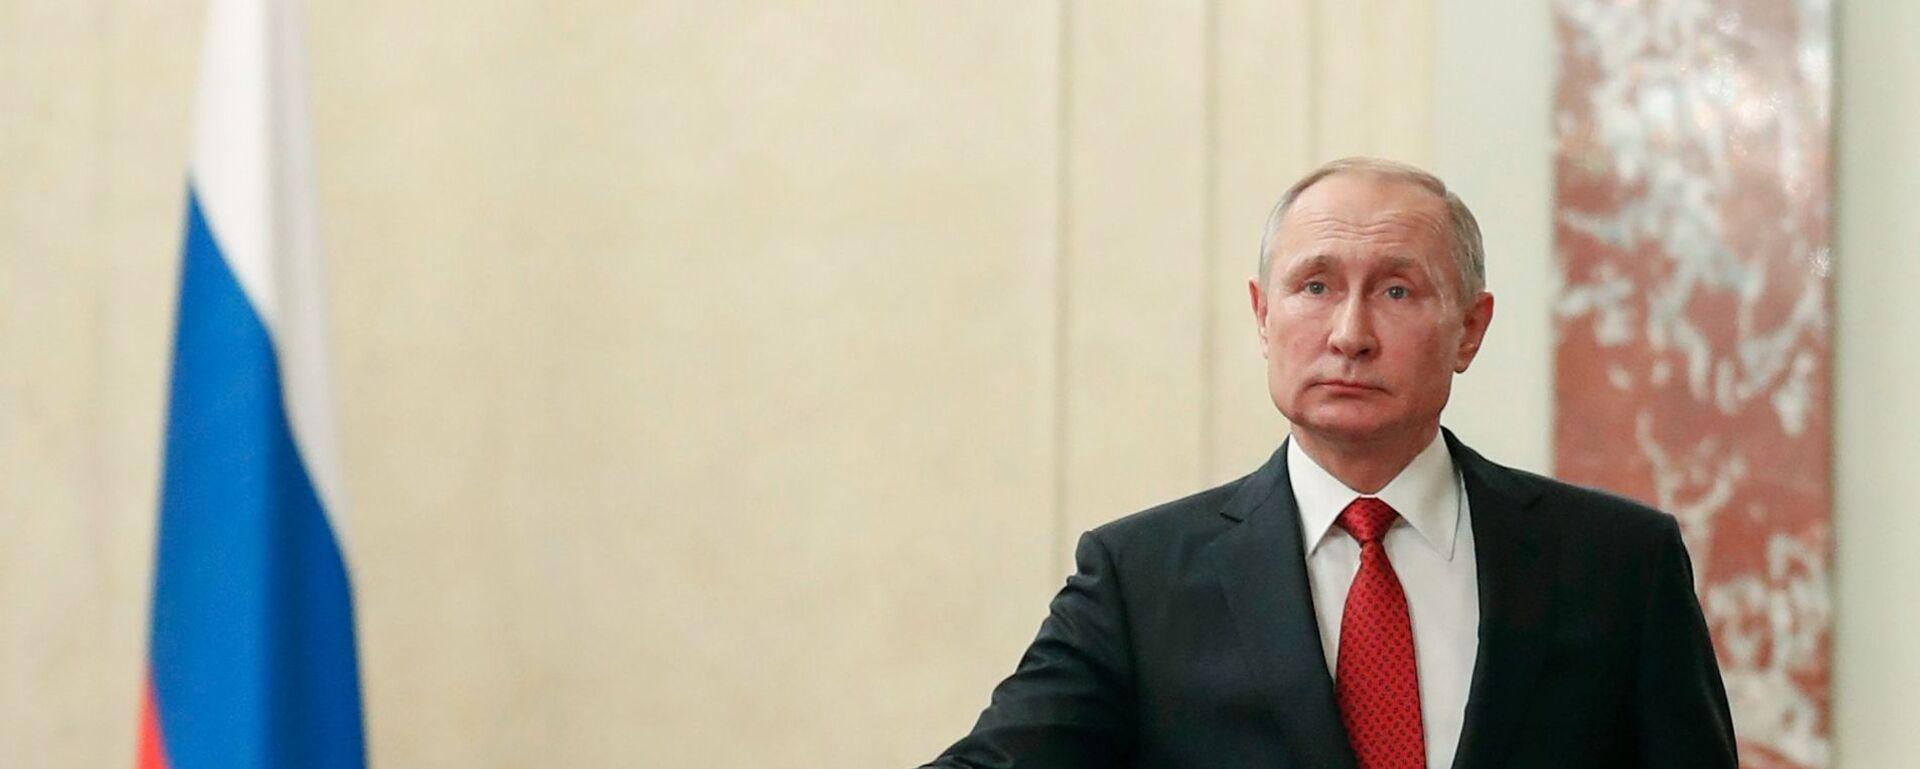 Vladimir Putin - Sputnik Česká republika, 1920, 13.05.2021